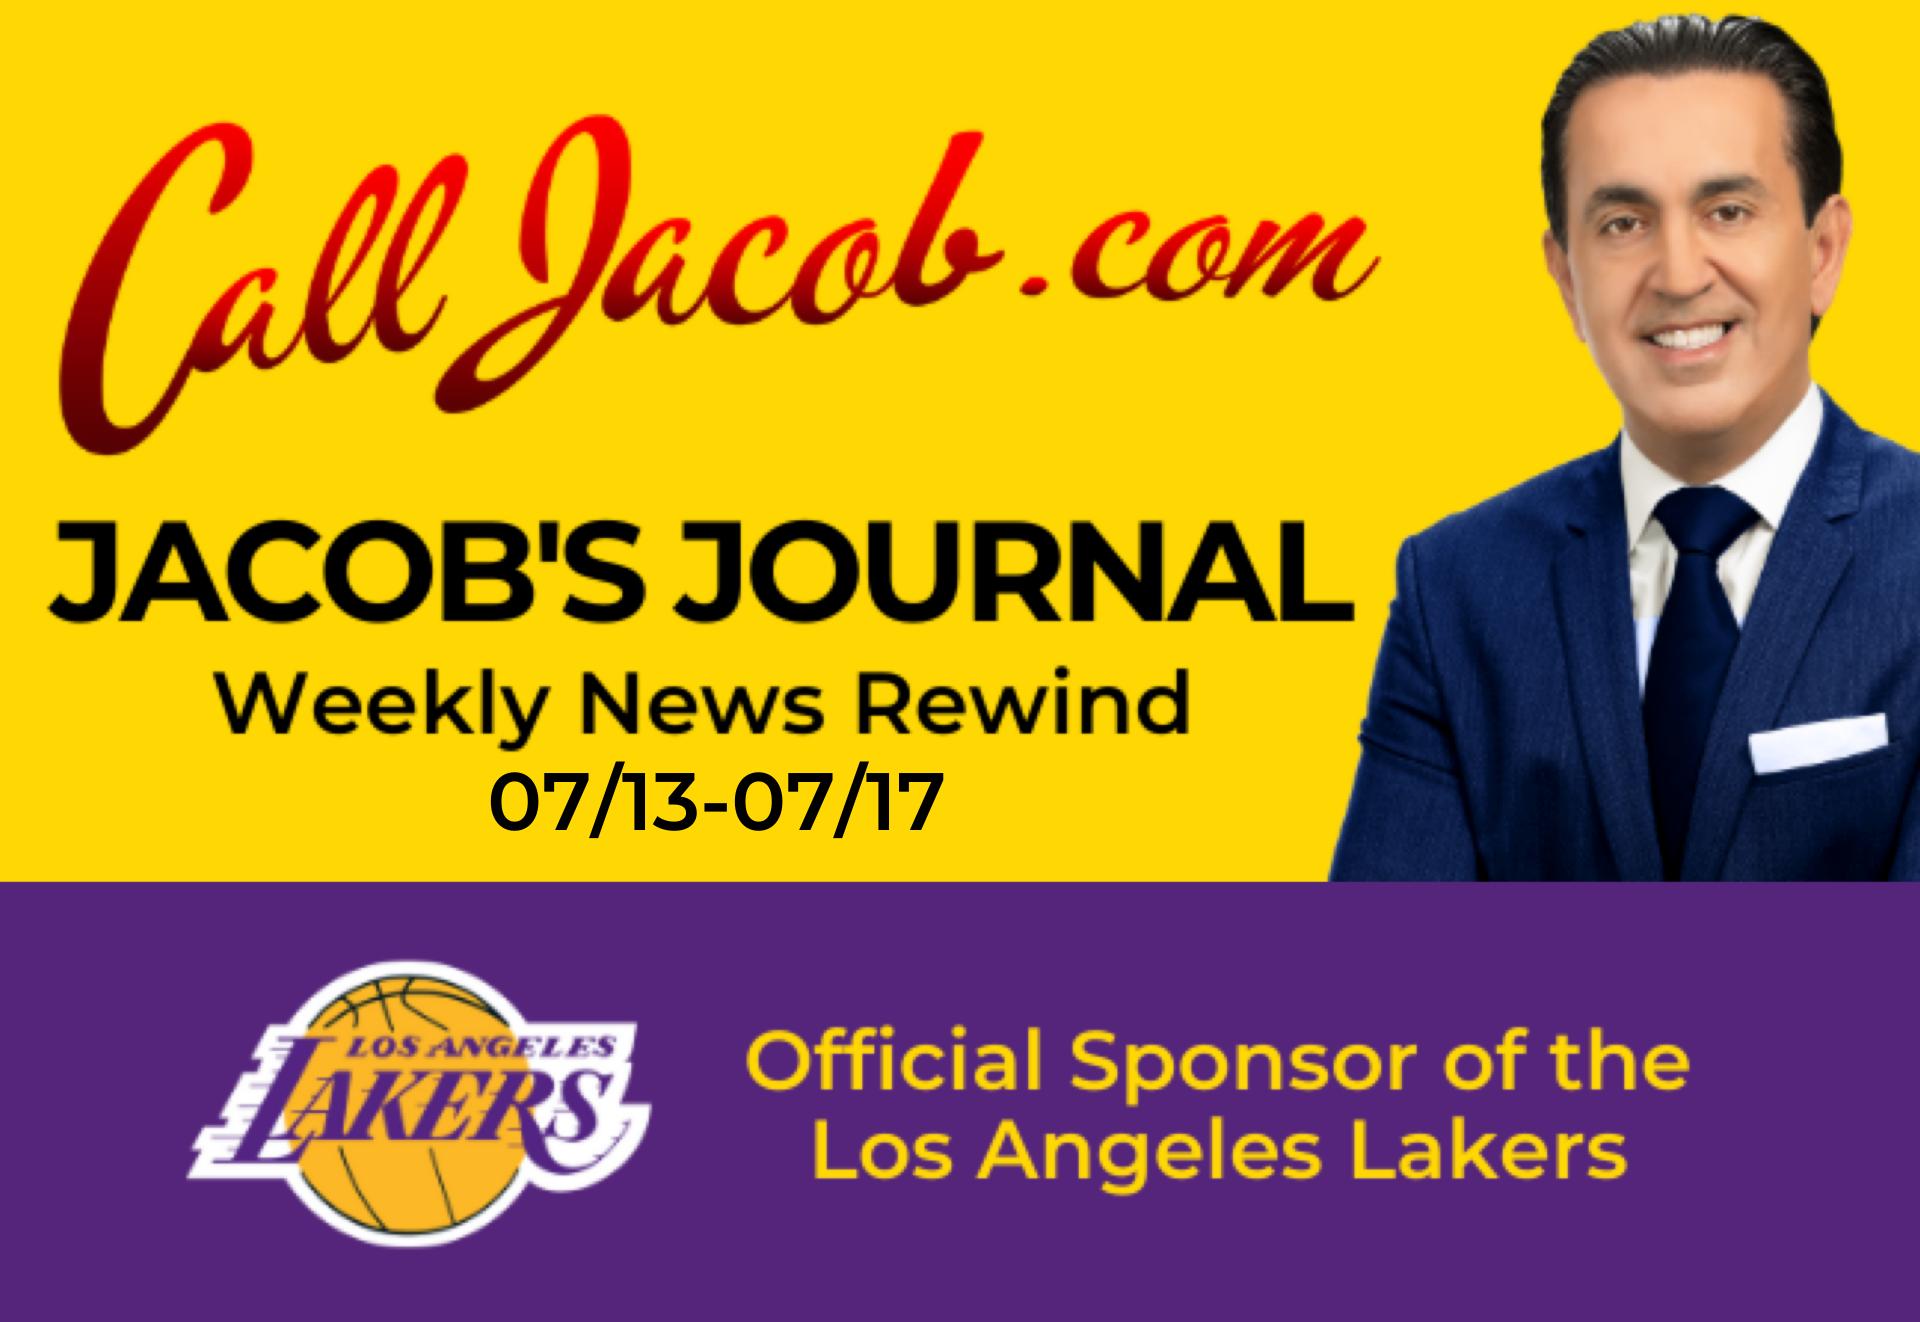 JacobsJournalWeeklyNewsRewind-07_13-07_17